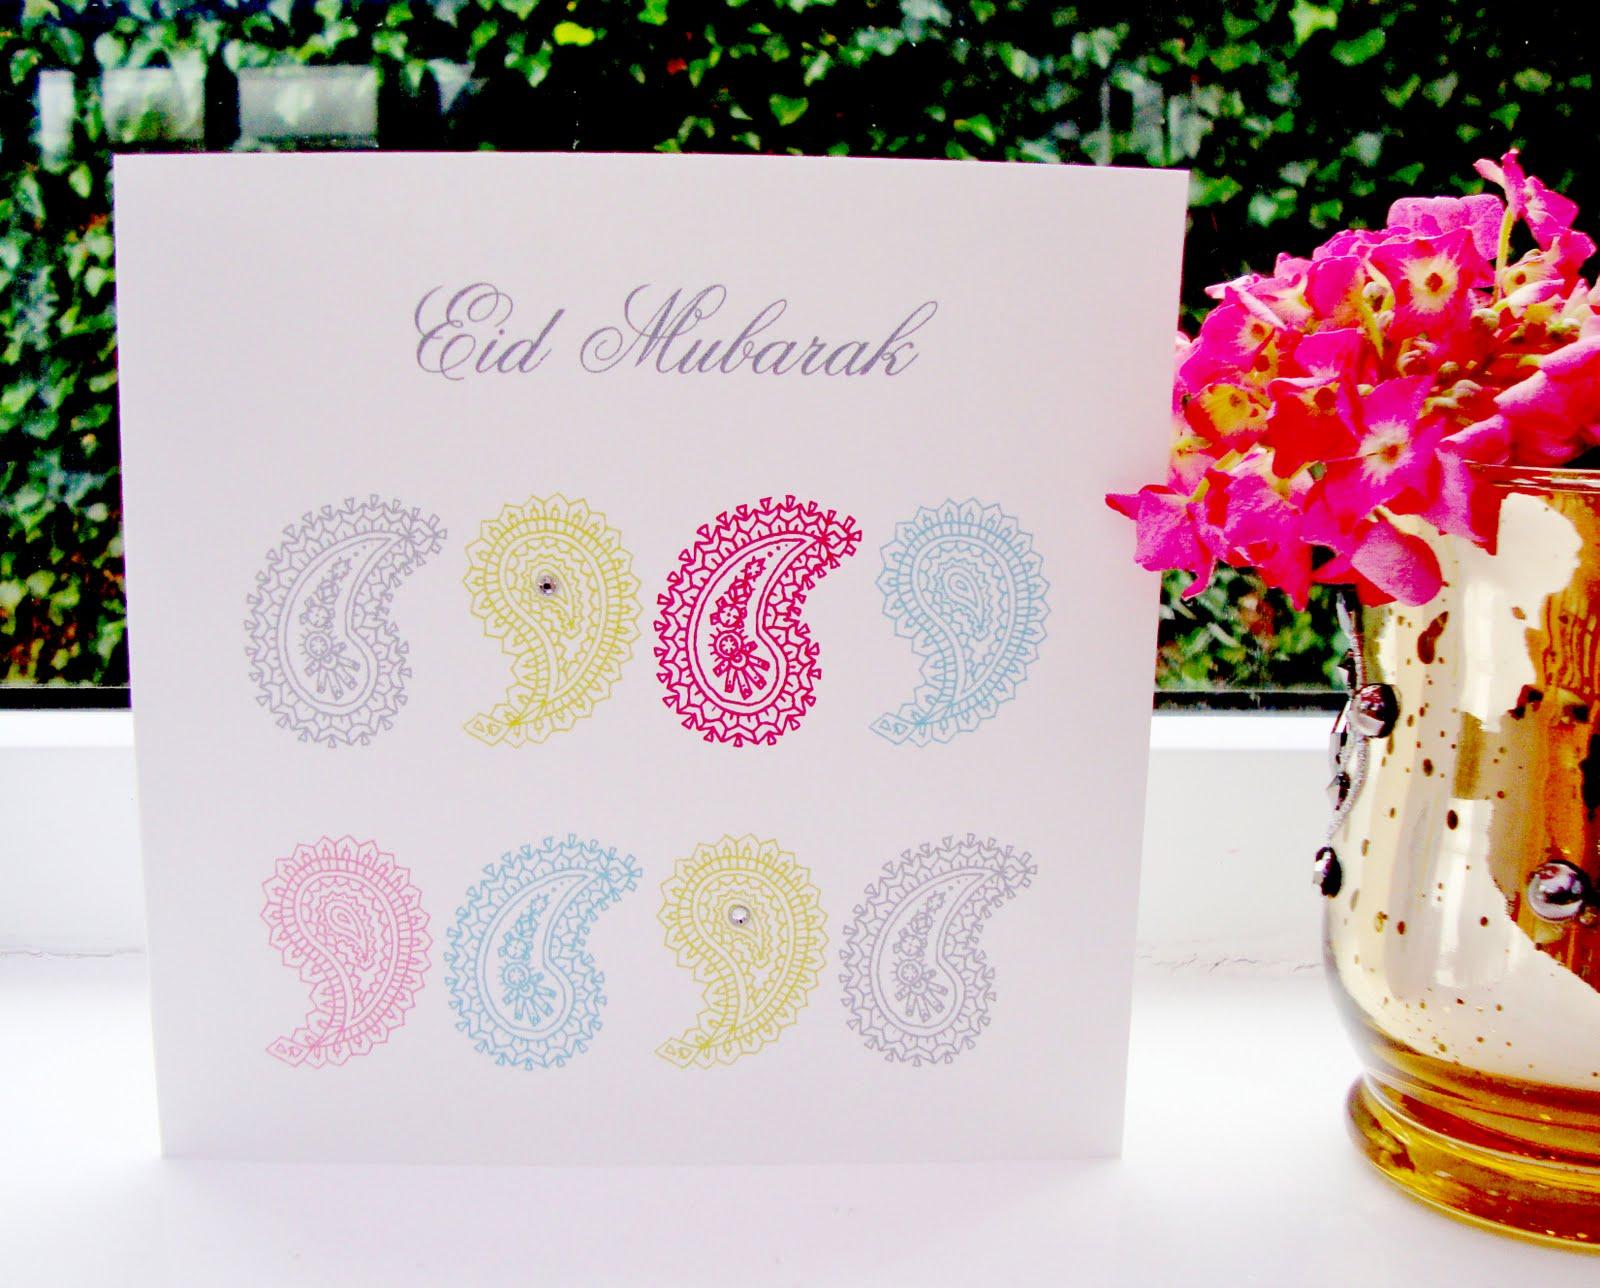 sabah designs eid card designs